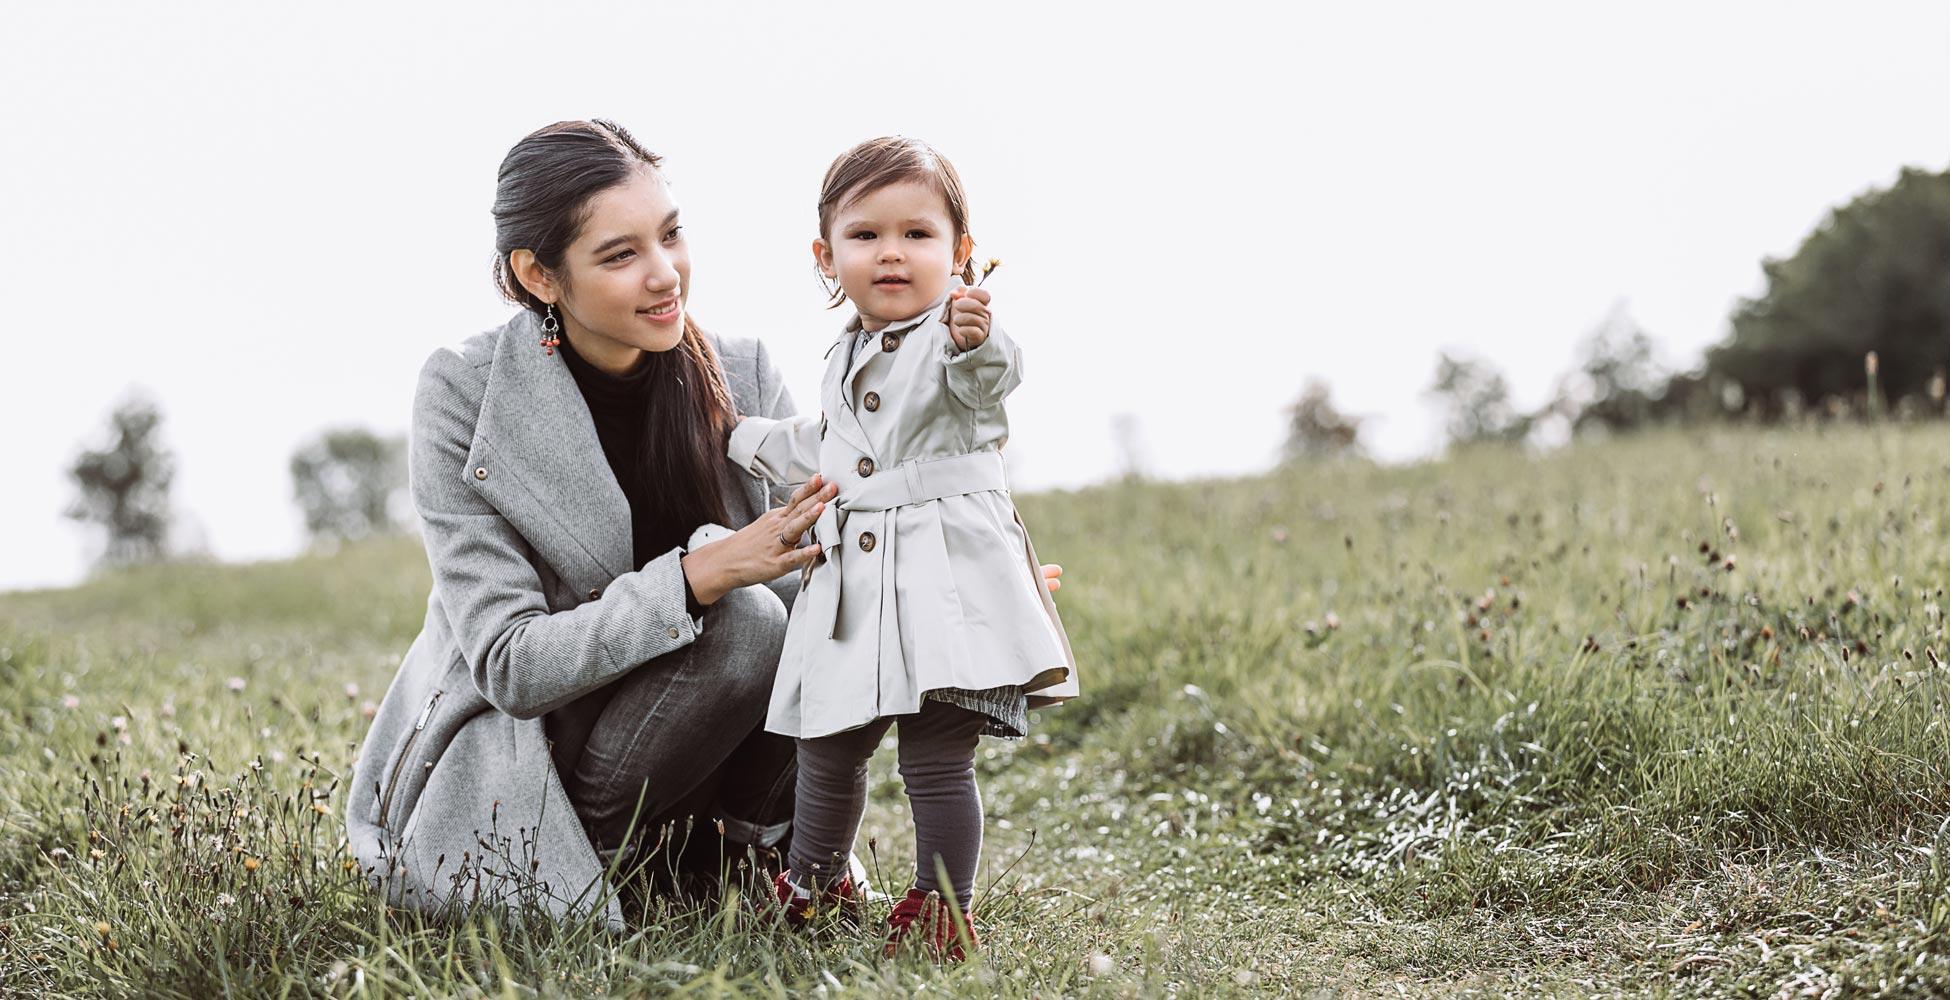 Fotograf Chemnitz Familienportrait und Familienfotografie